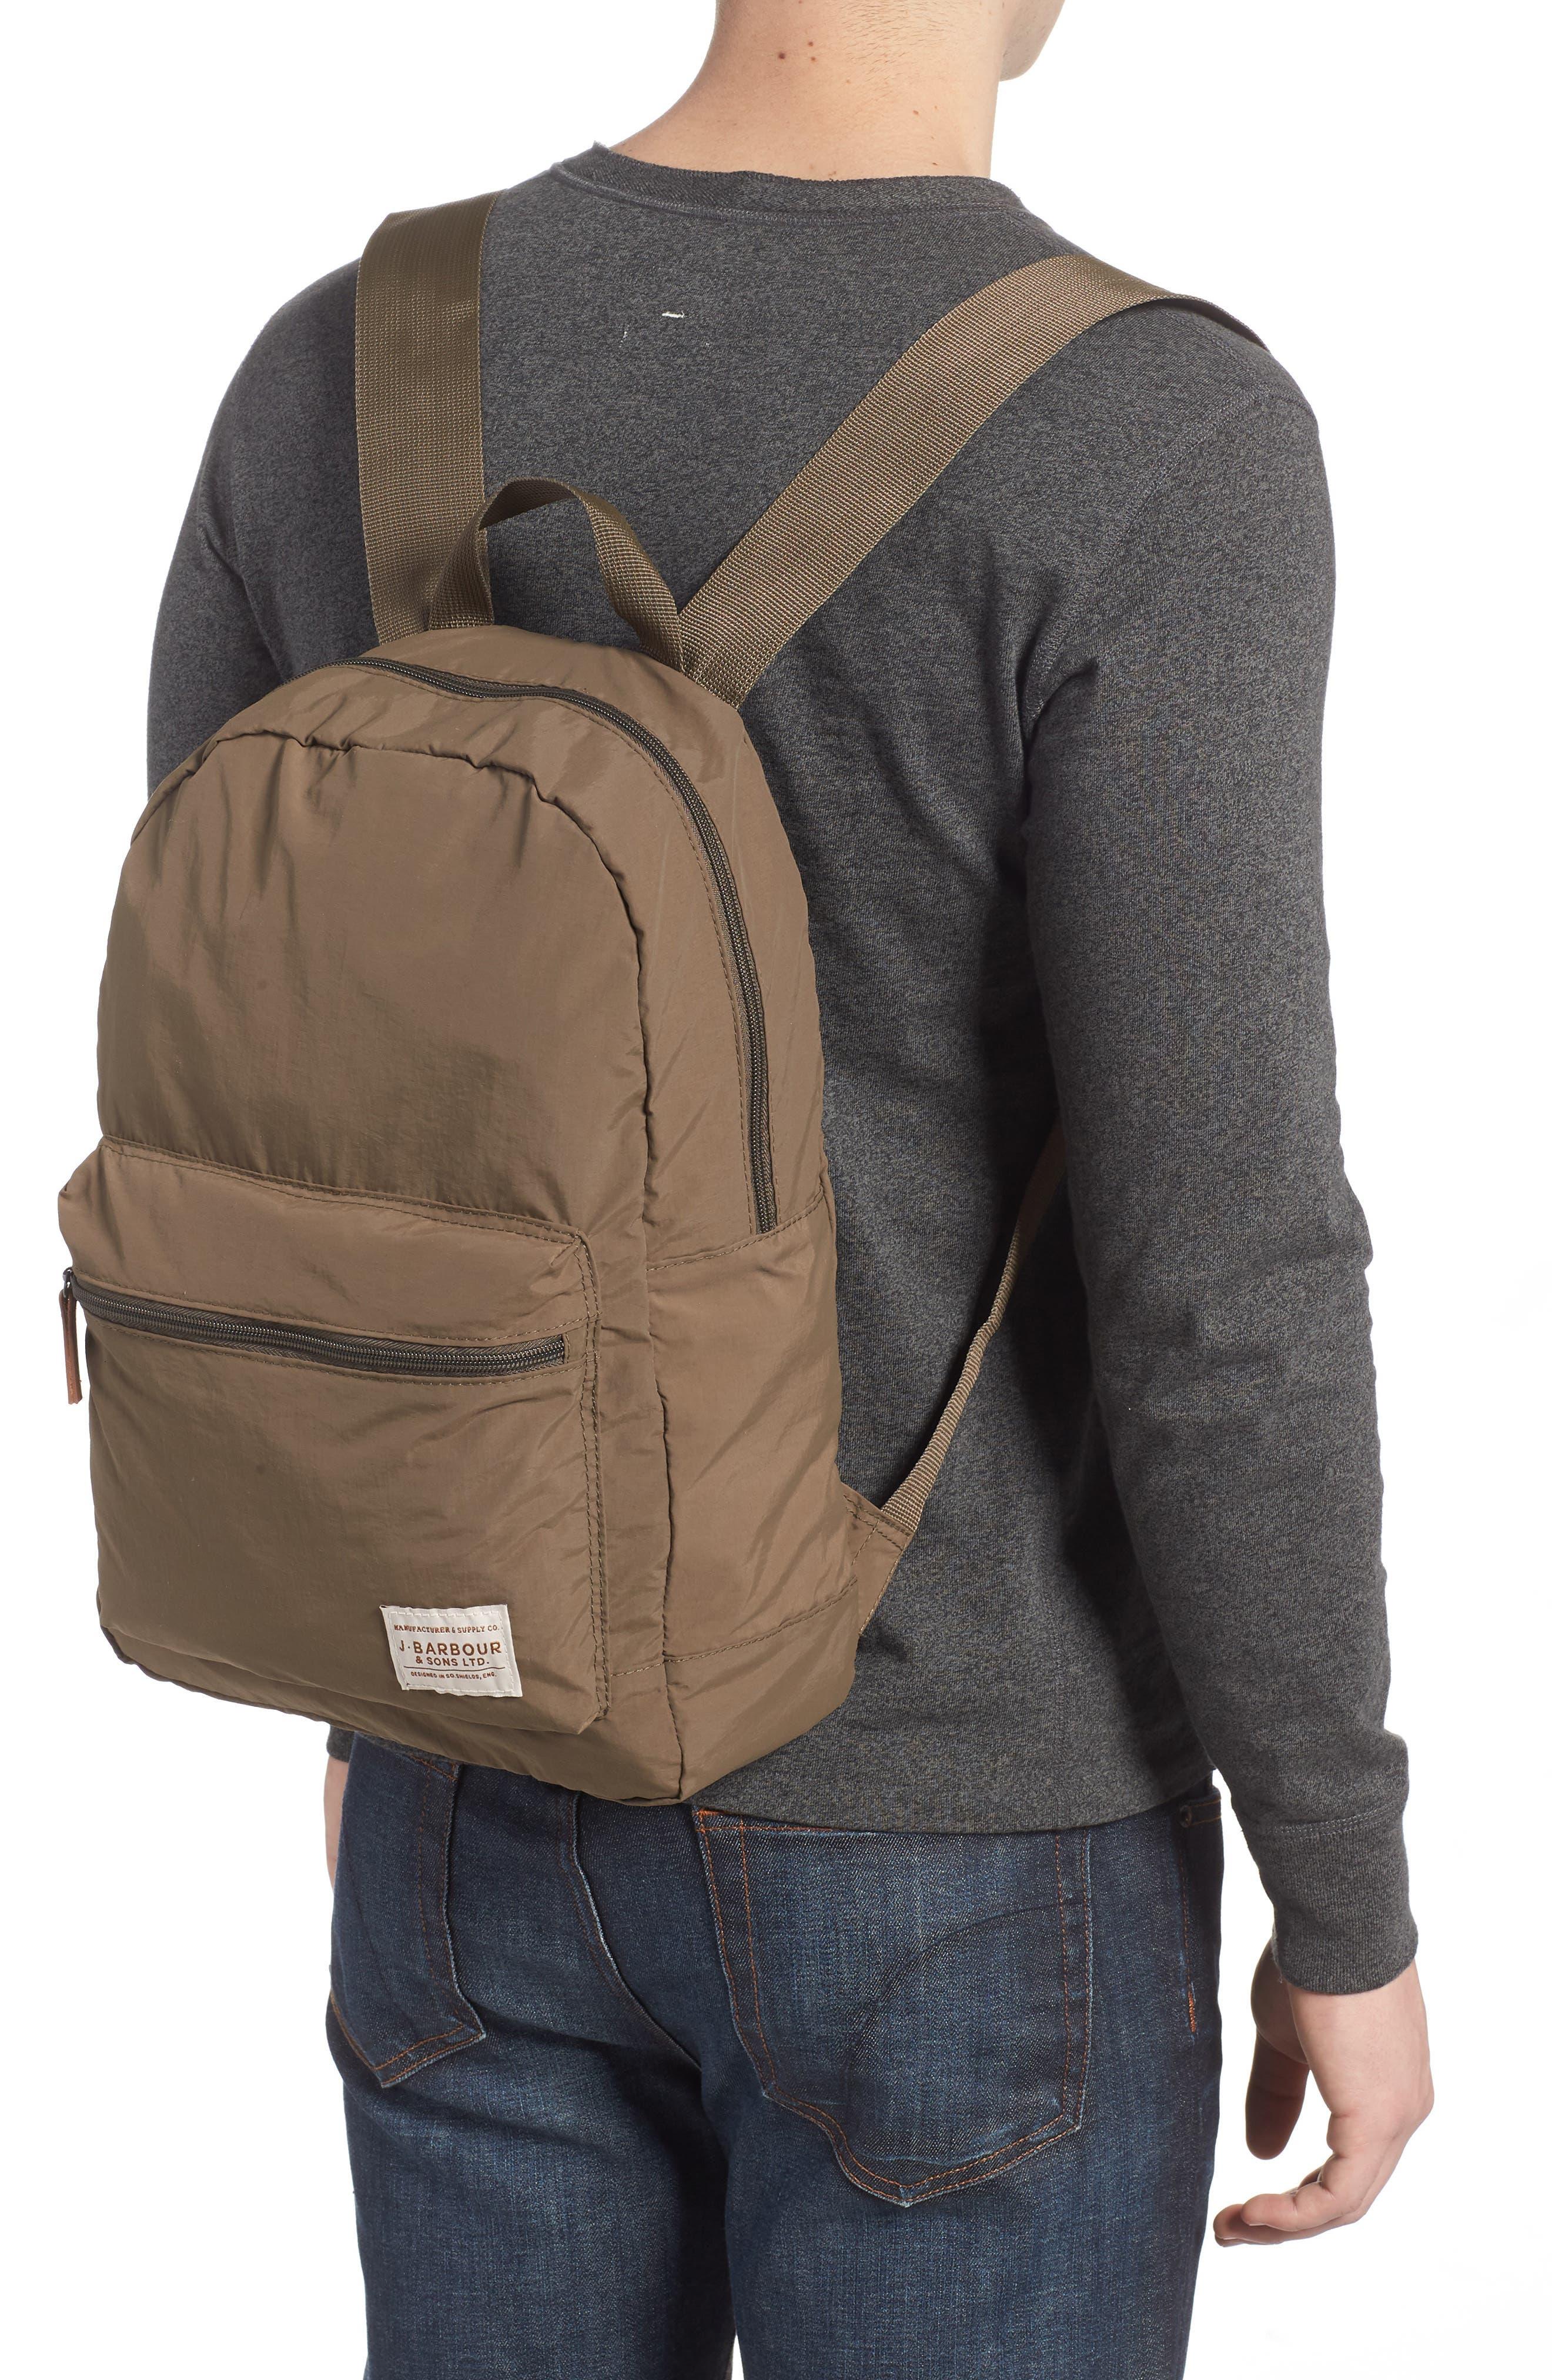 Beauly Packable Backpack,                             Alternate thumbnail 2, color,                             KHAKI